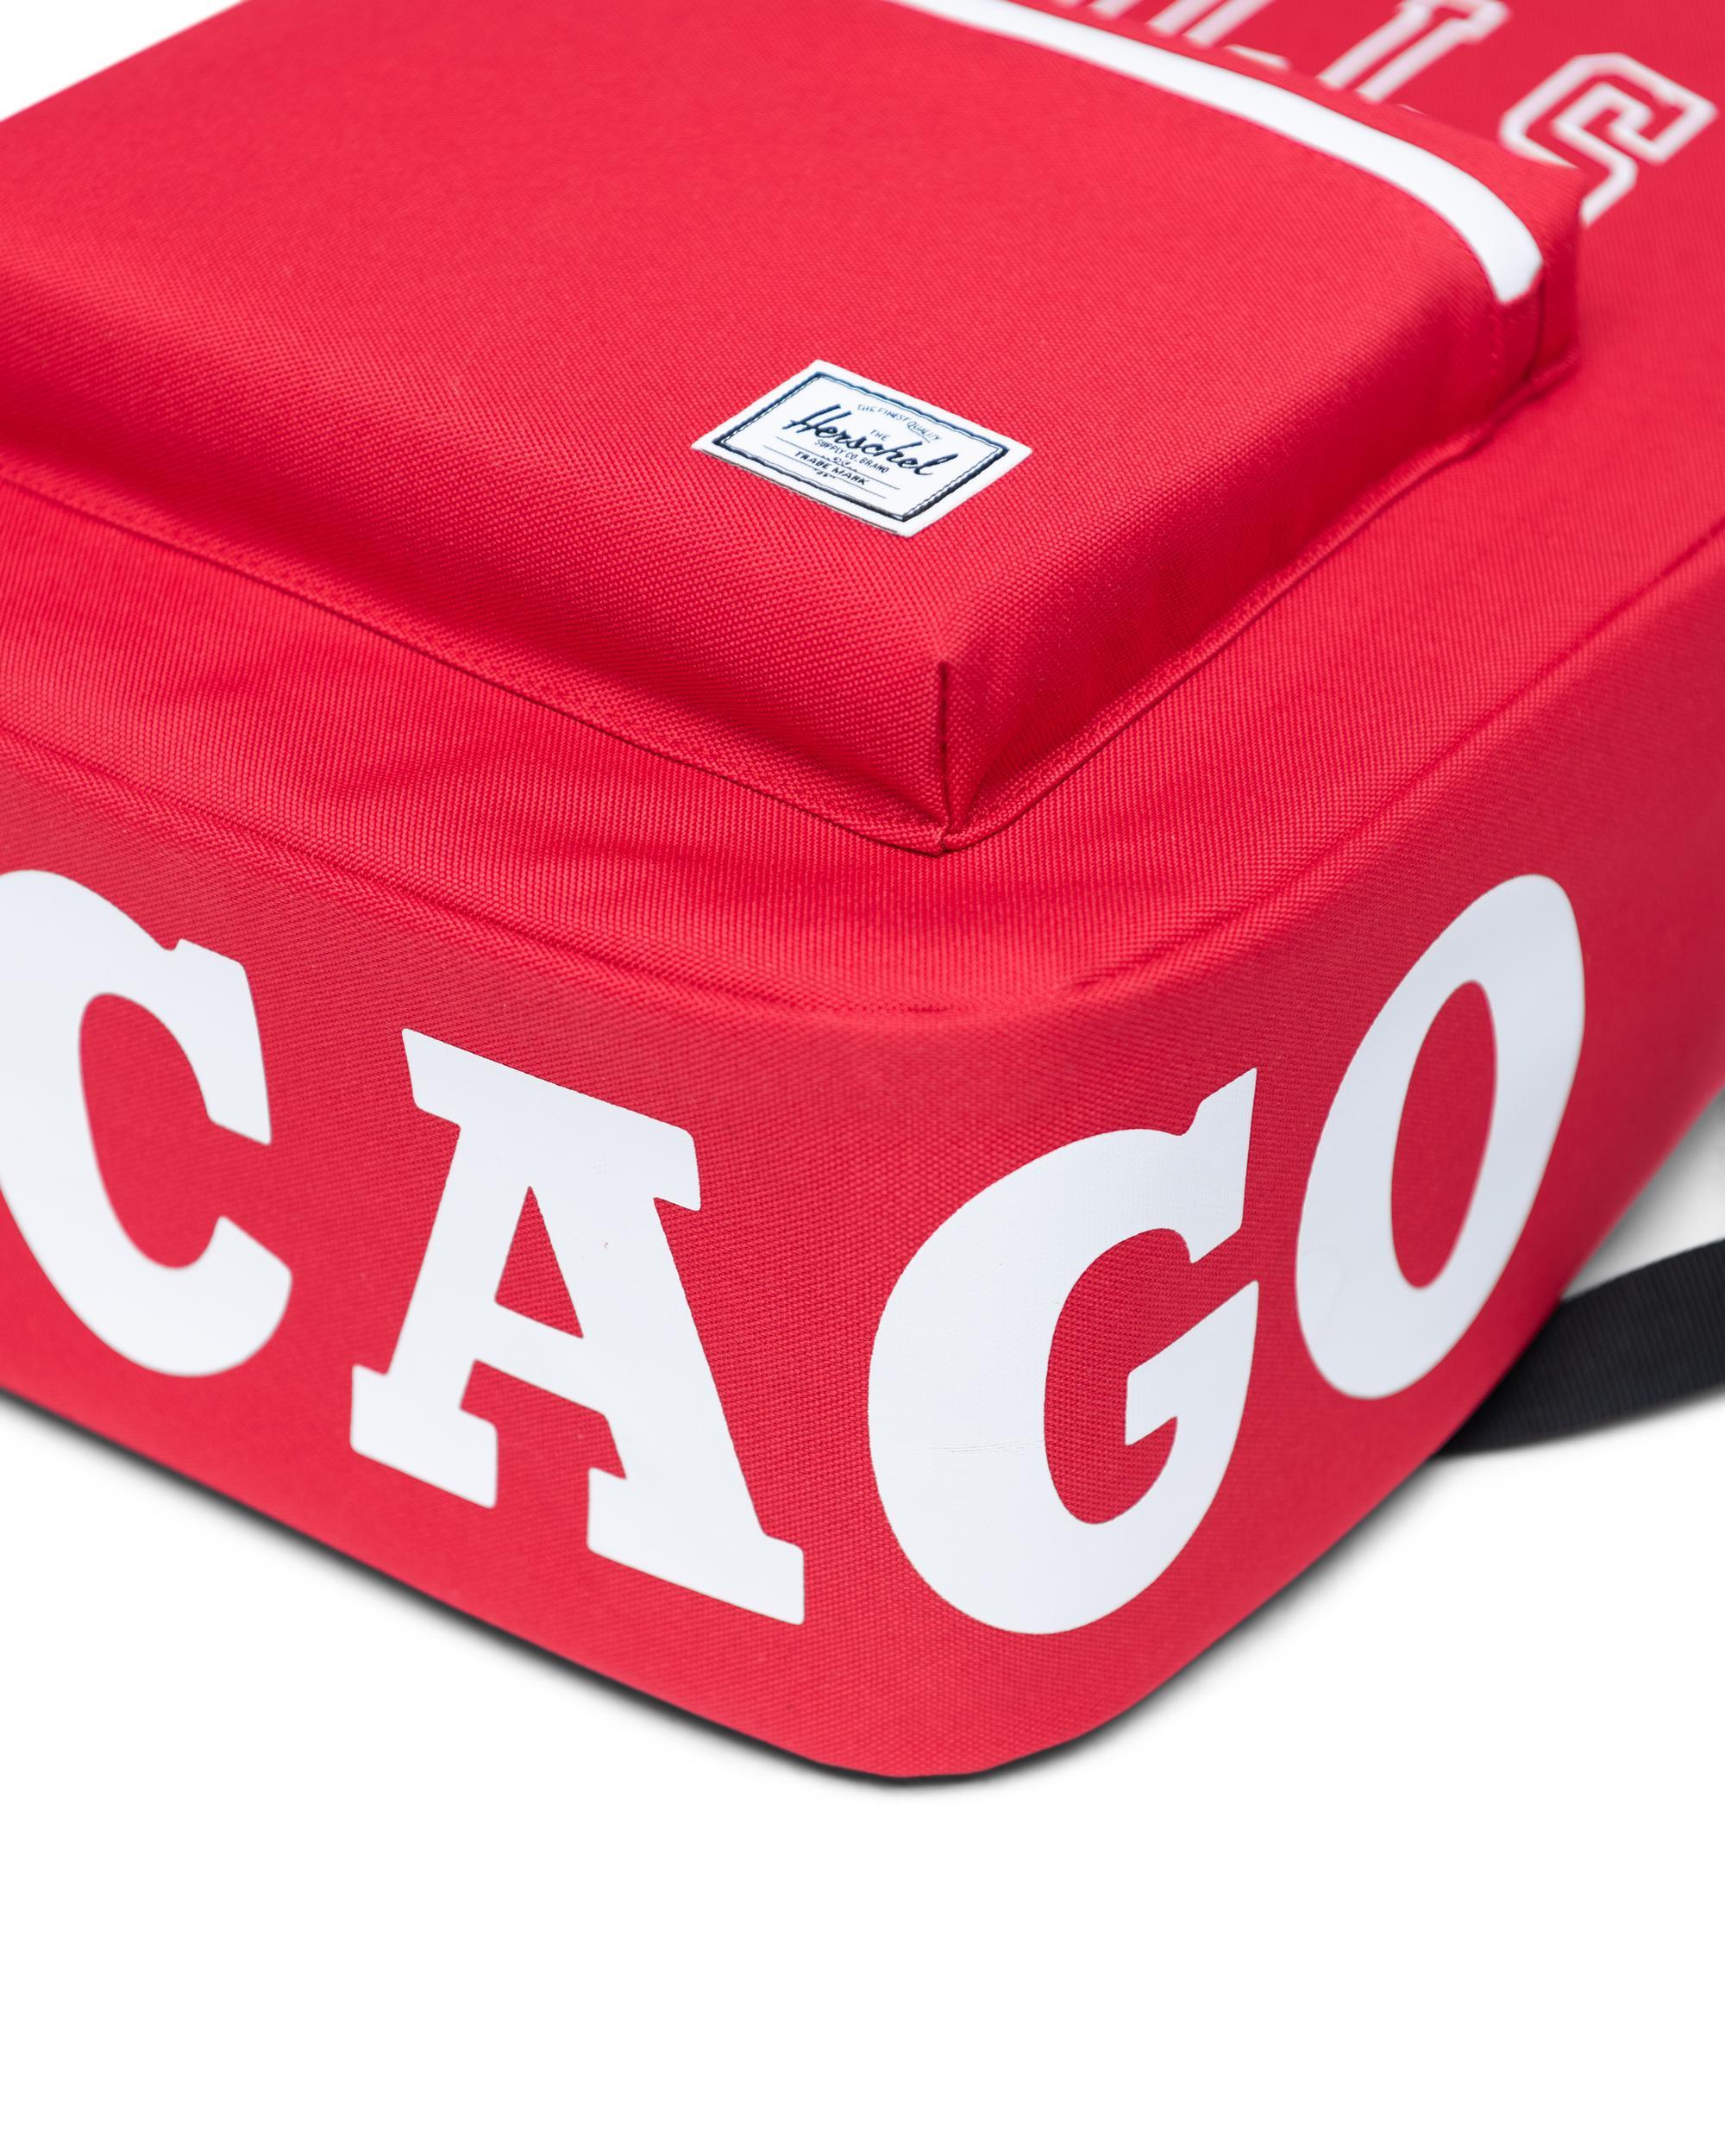 d36cea1d6c3 ... Custom internal team label   NBA liner print ...